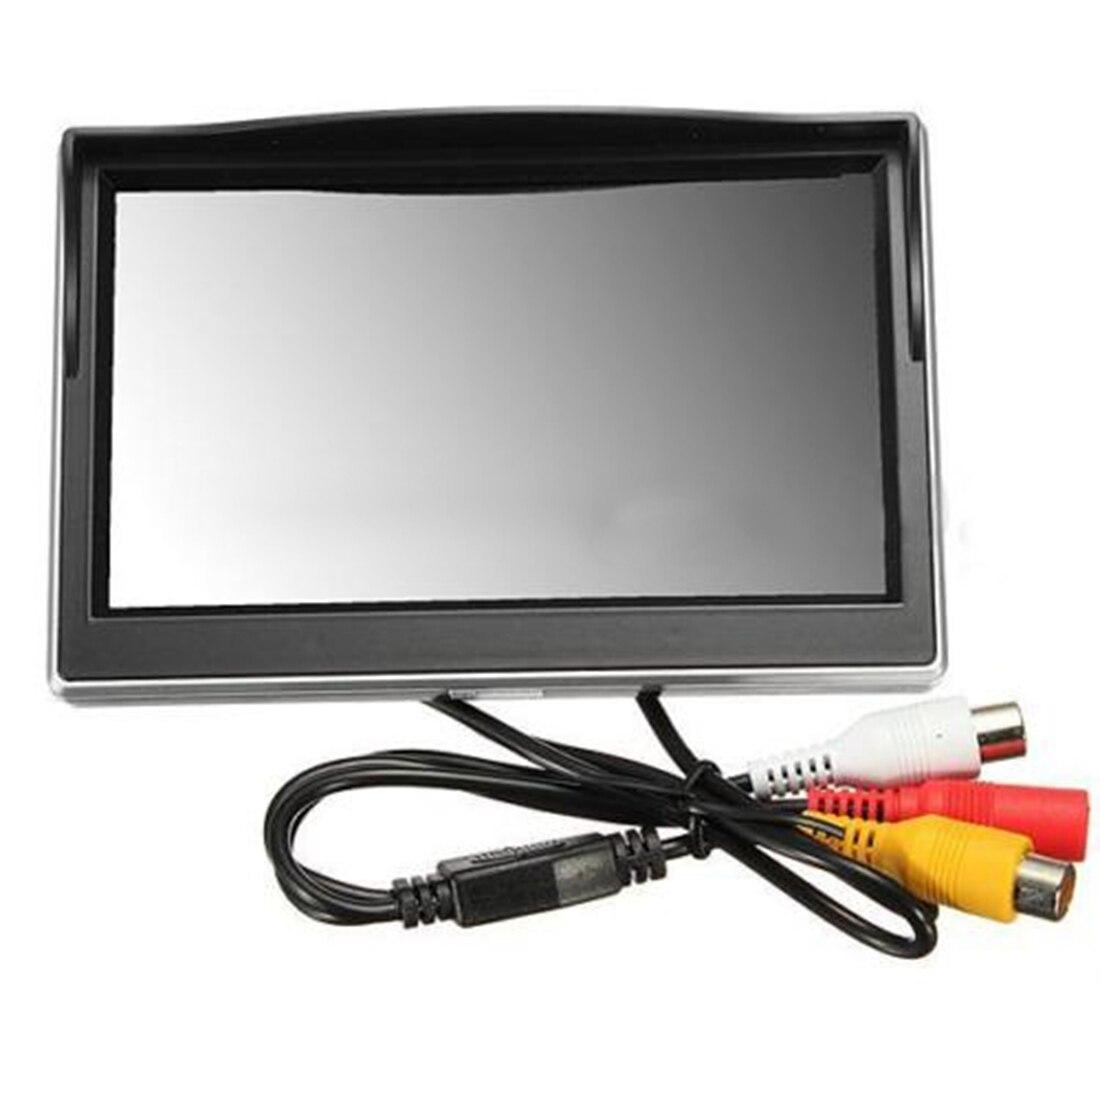 "Авто "" 800*480 TFT lcd HD экран монитор для автомобиля заднего вида резервная камера"